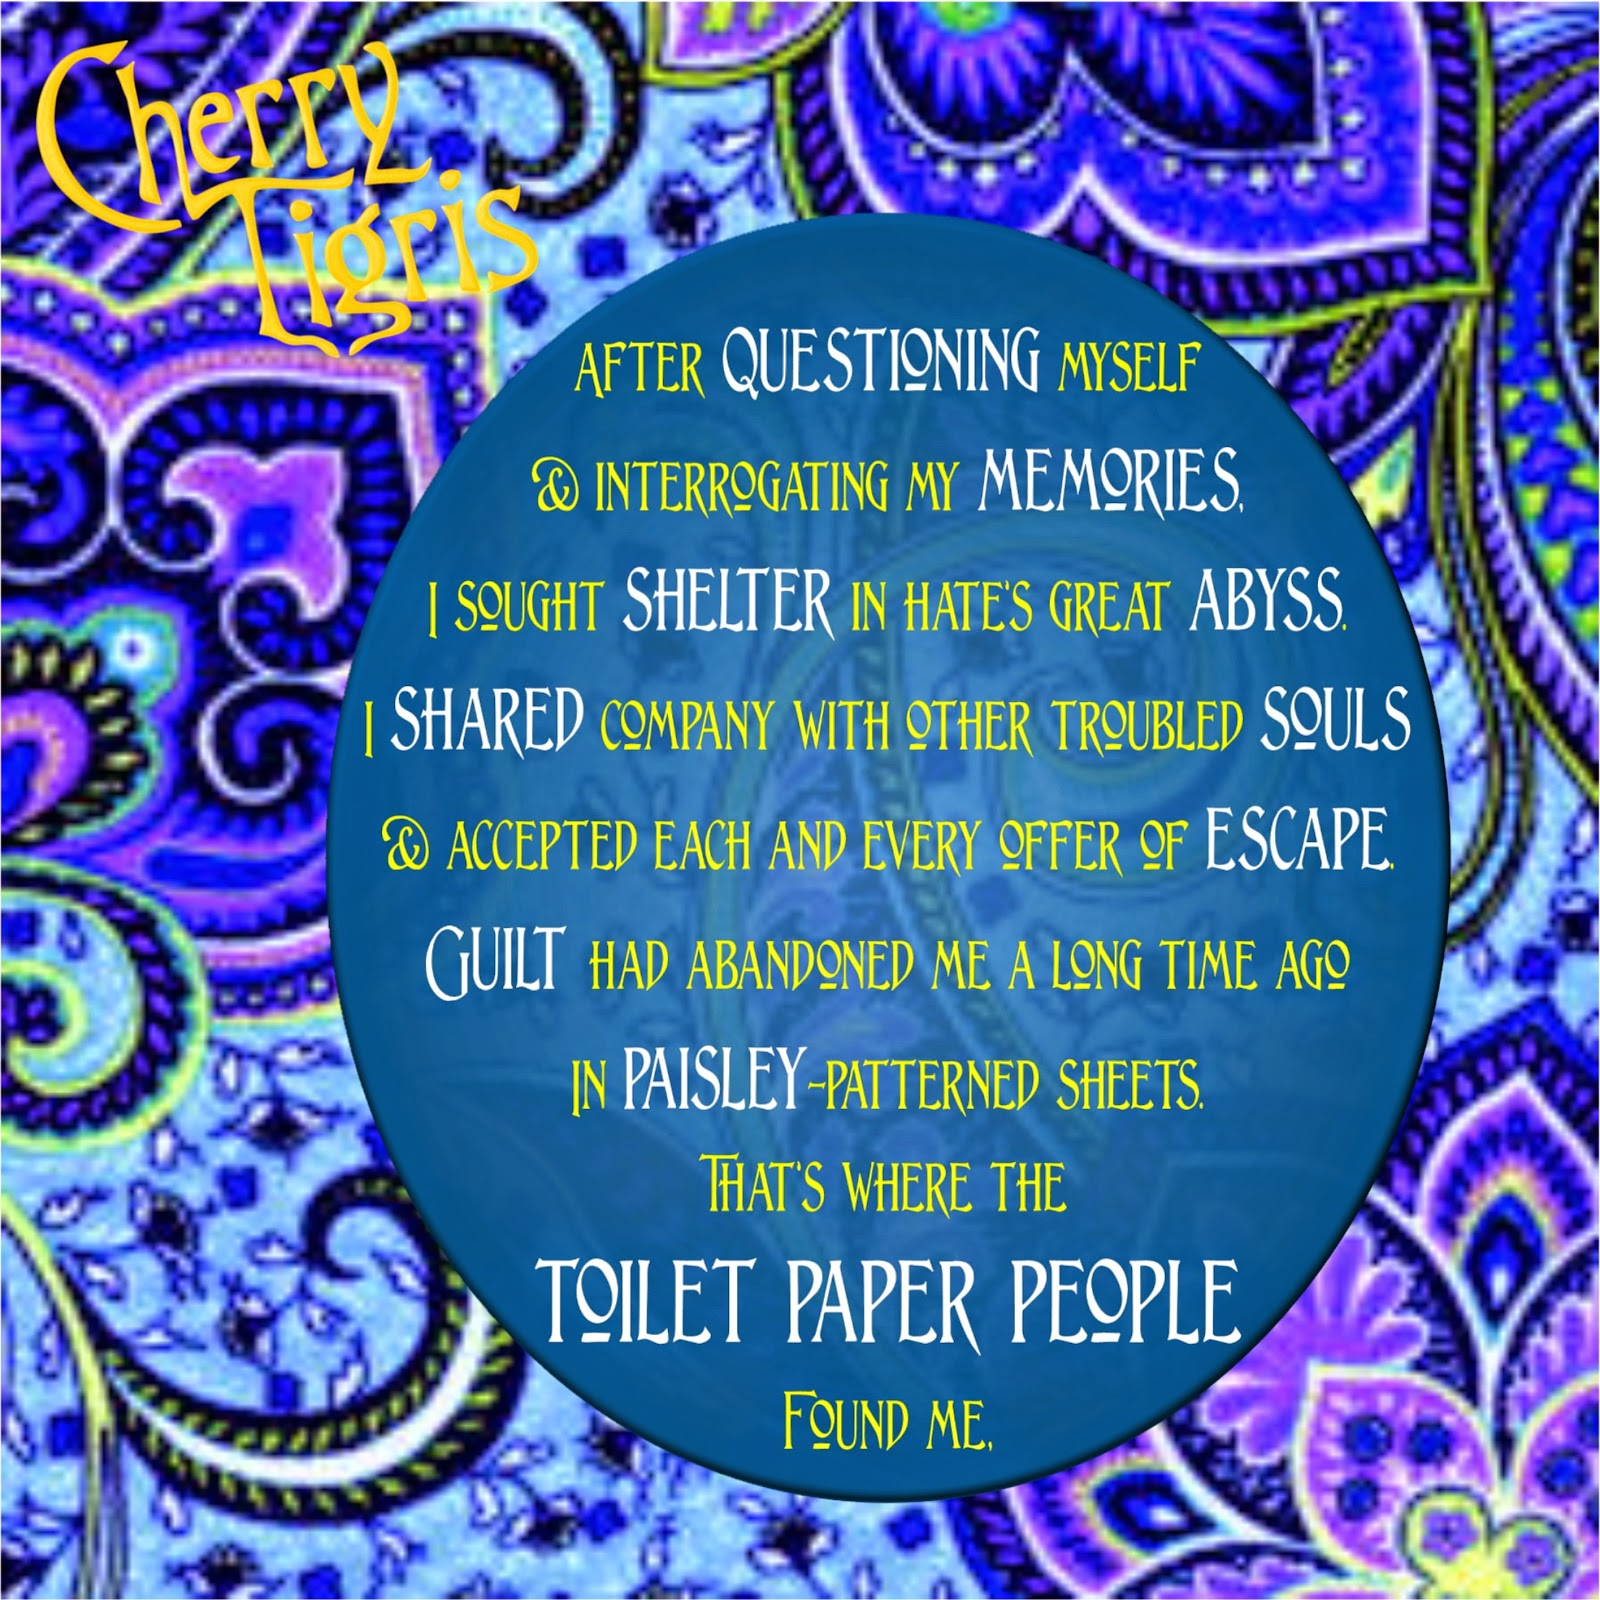 http://www.amazon.com/Toilet-Paper-People-Cherry-Tigris/dp/1453855343